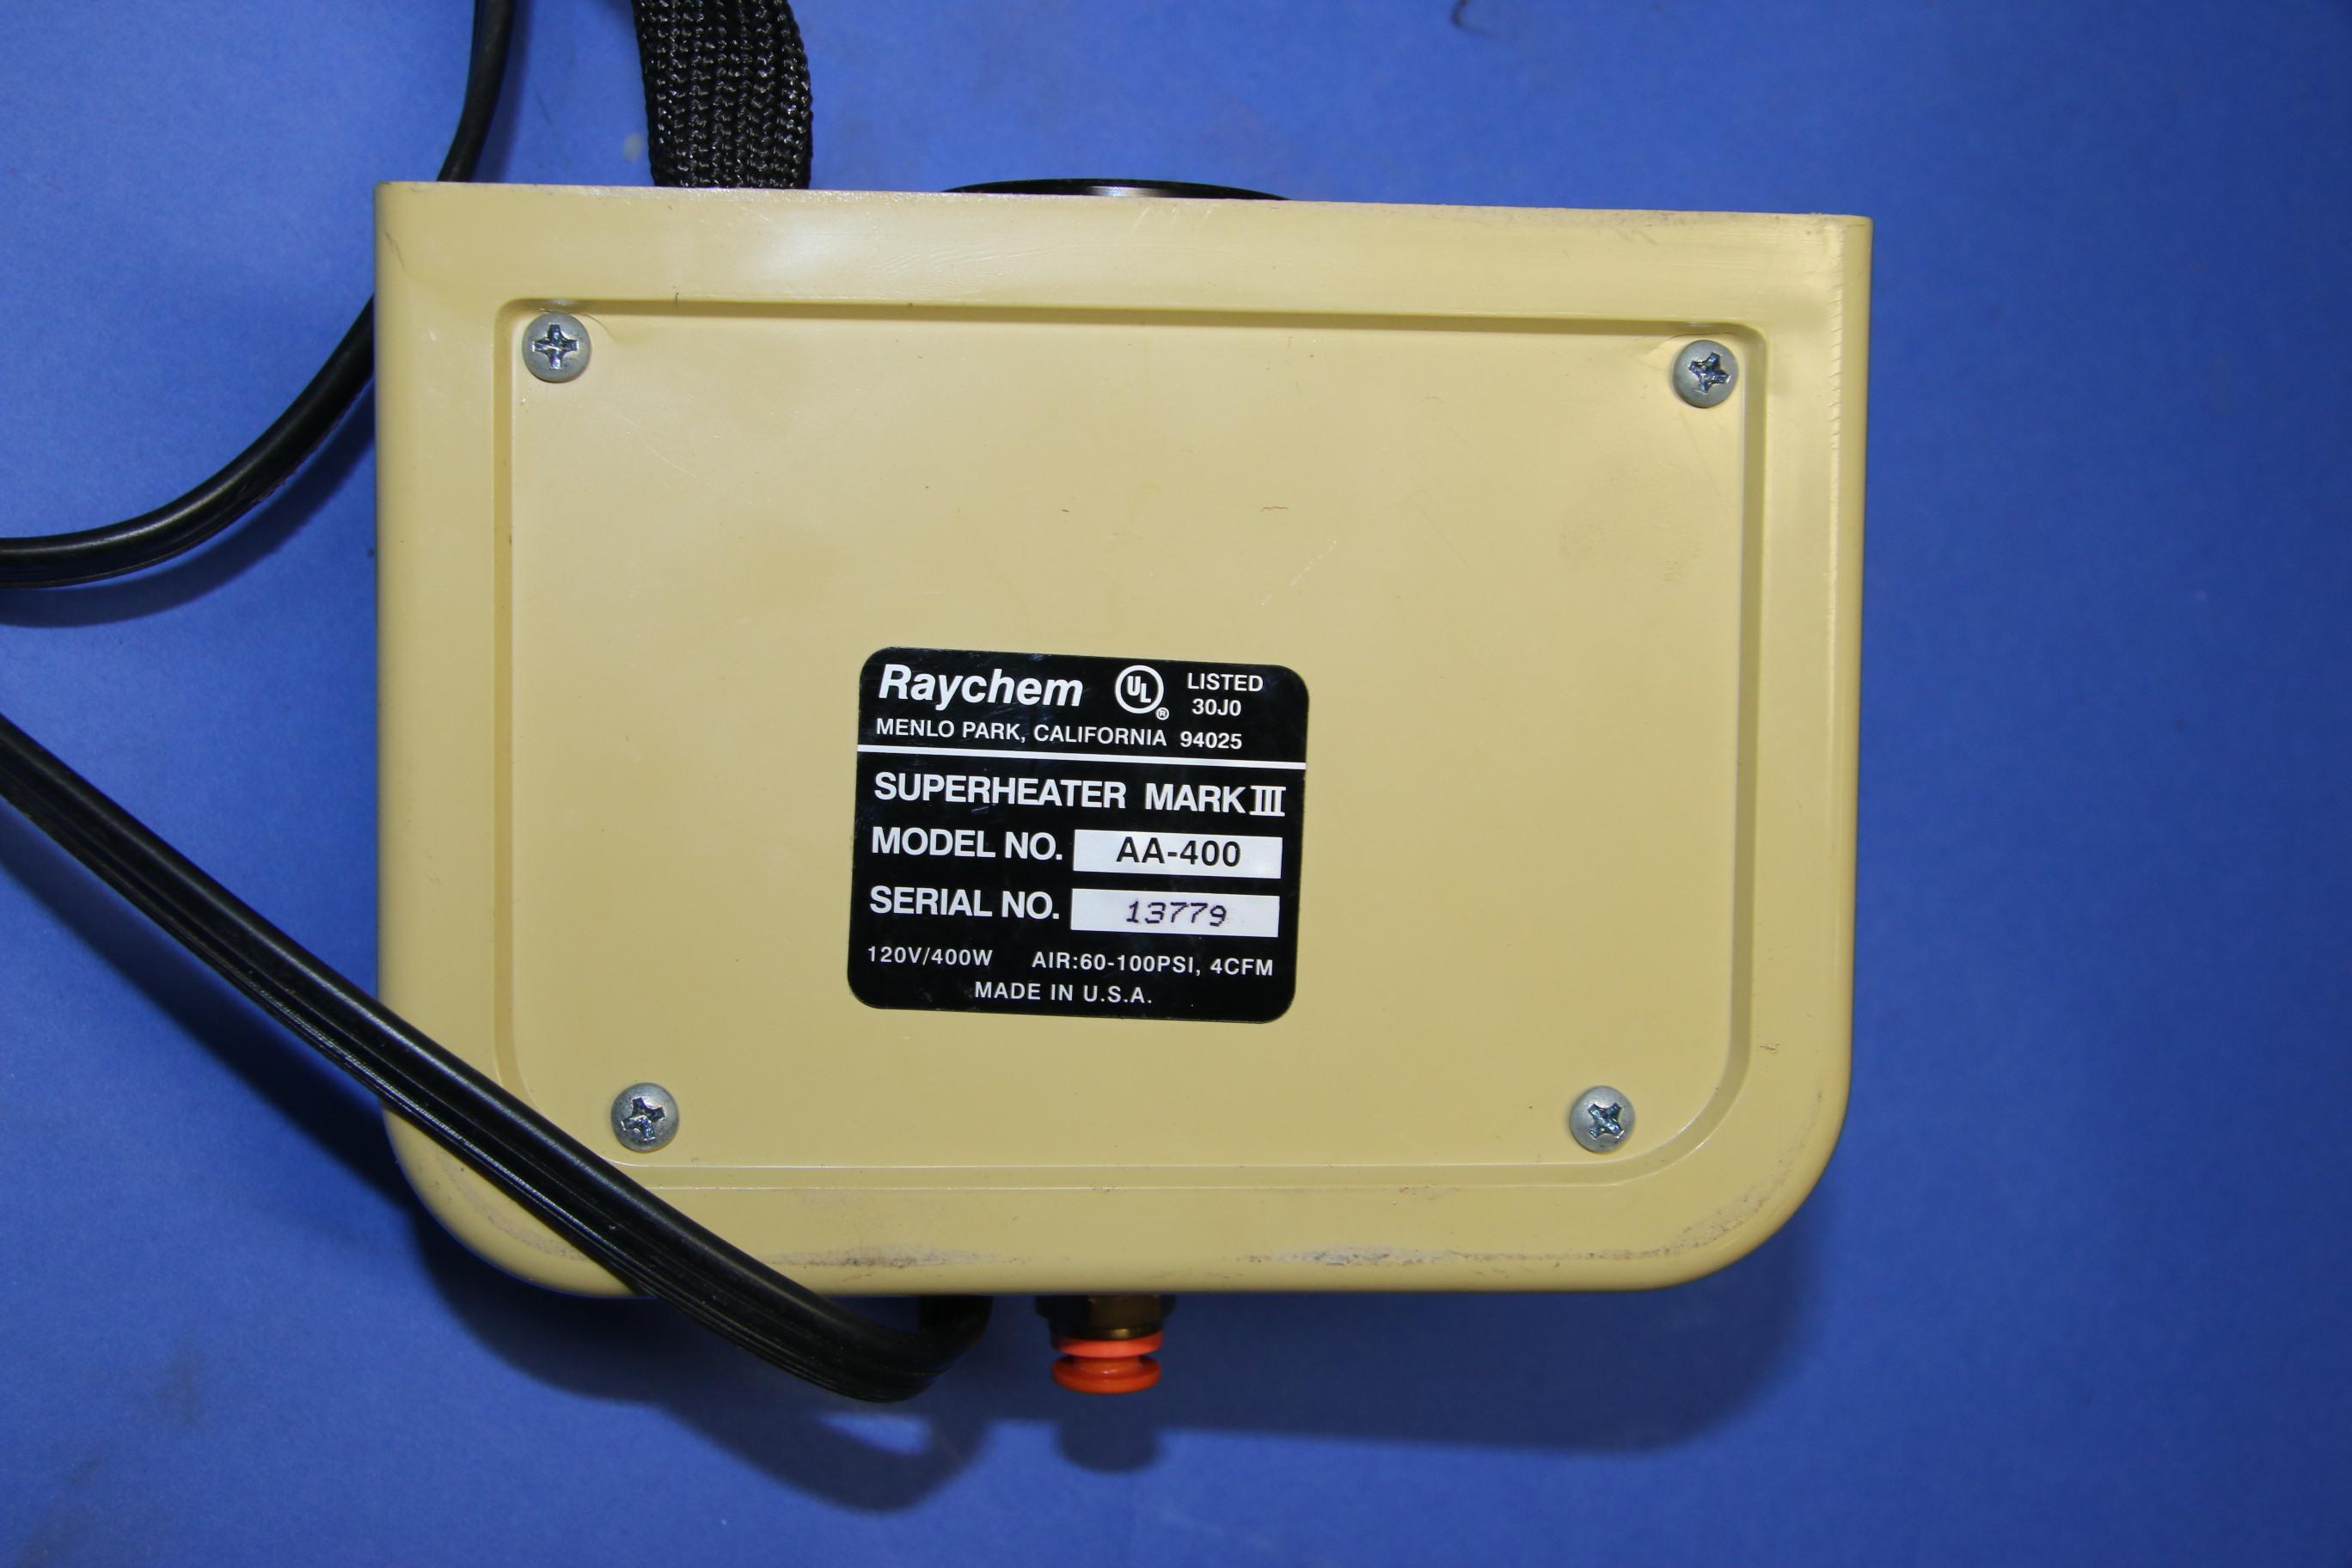 (2) Used Taychem AA-400 Super Heater 16938